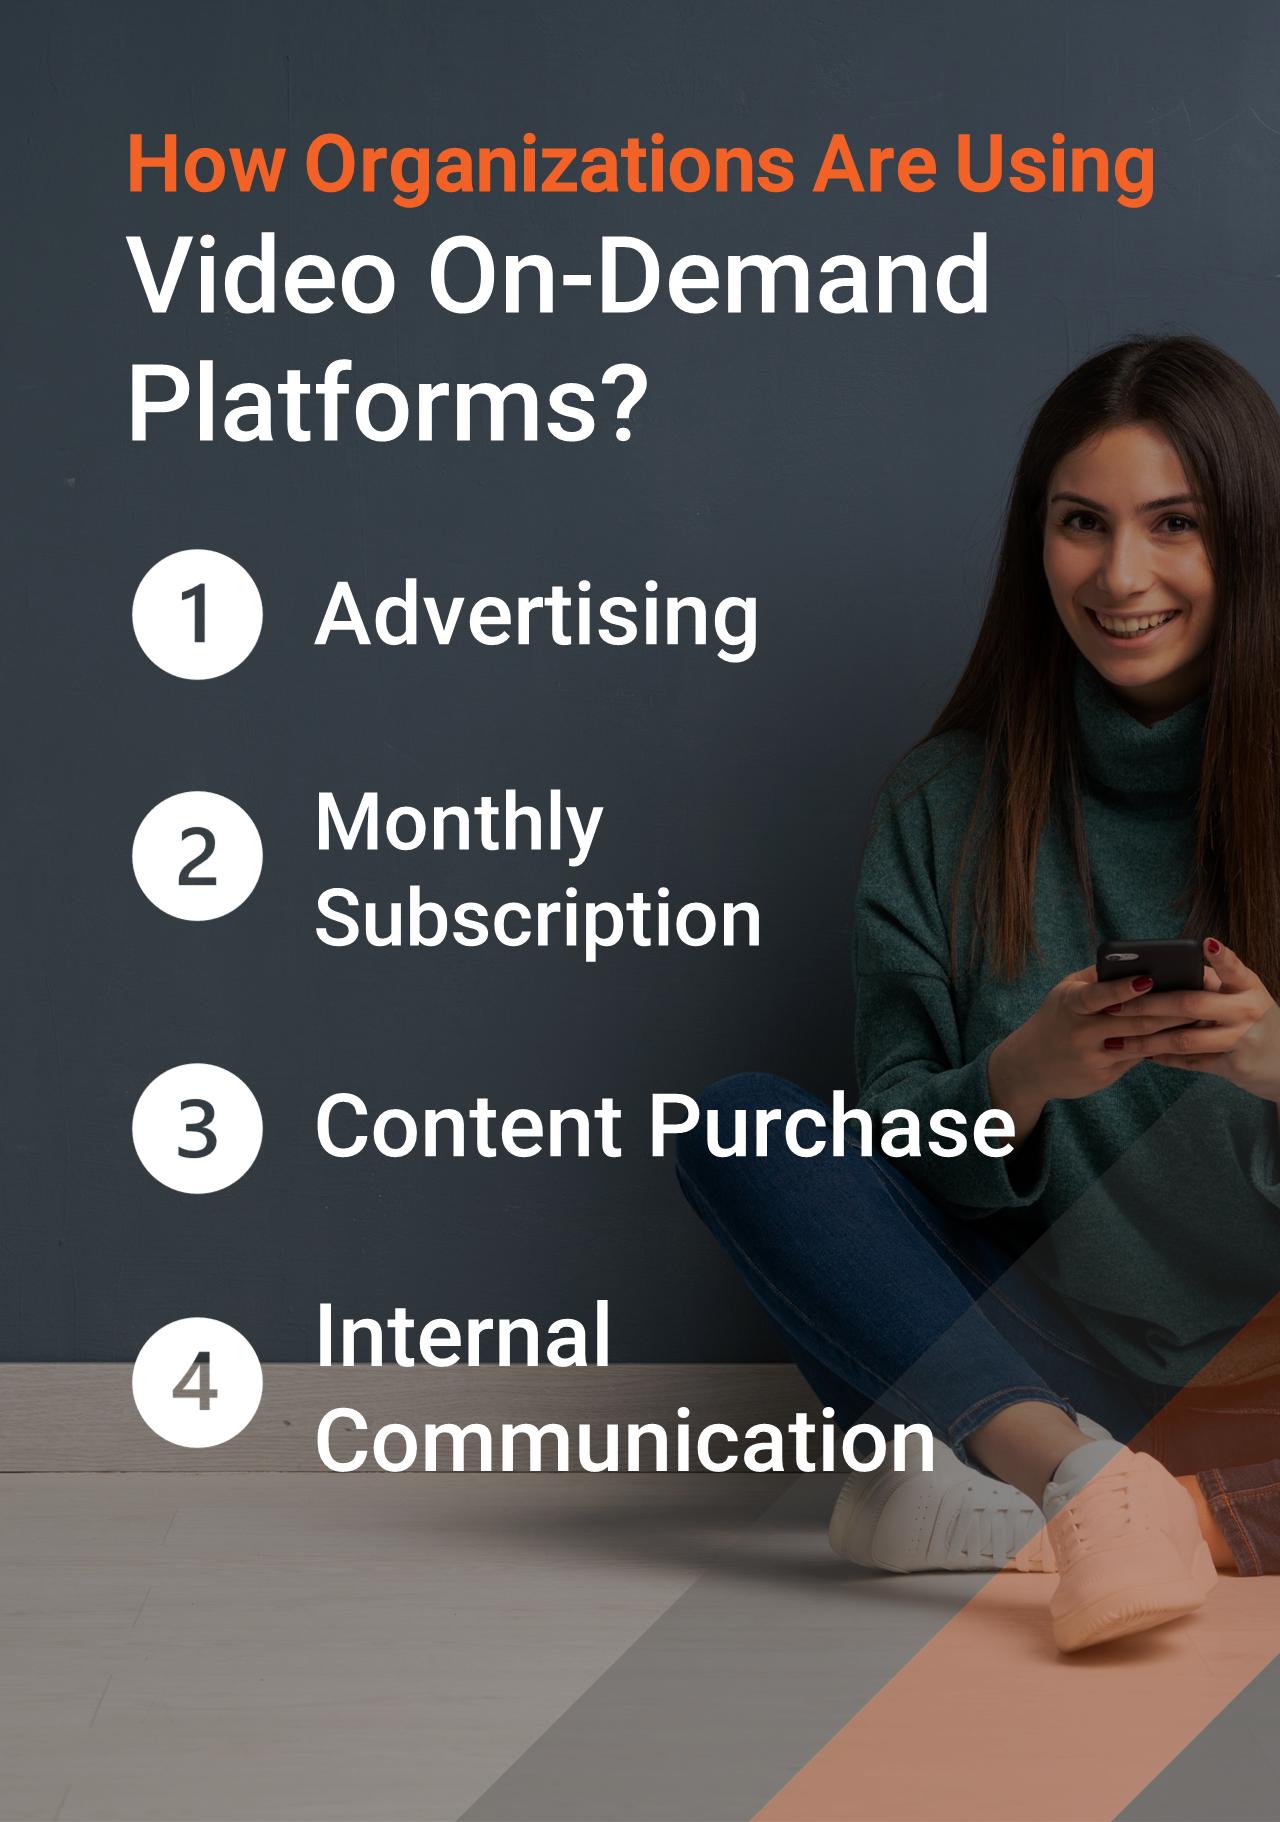 VOD Video Platform